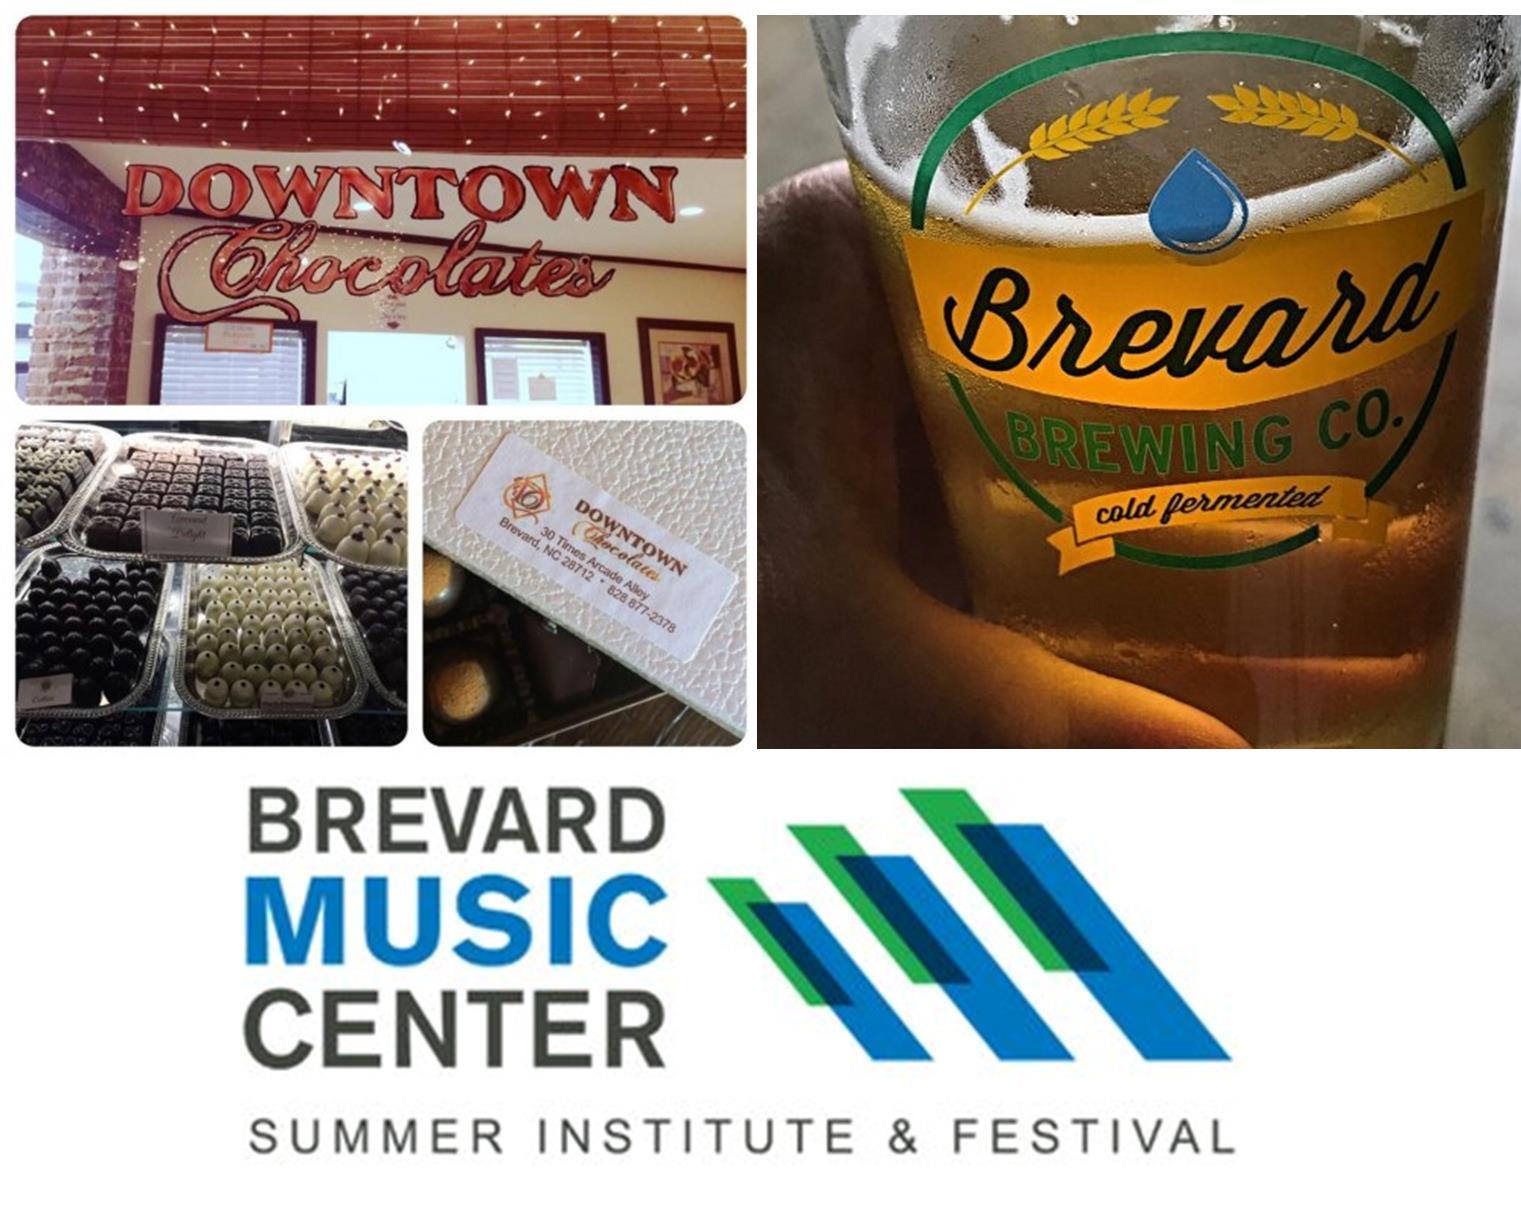 Brevard Music, Chocolate, and Brews